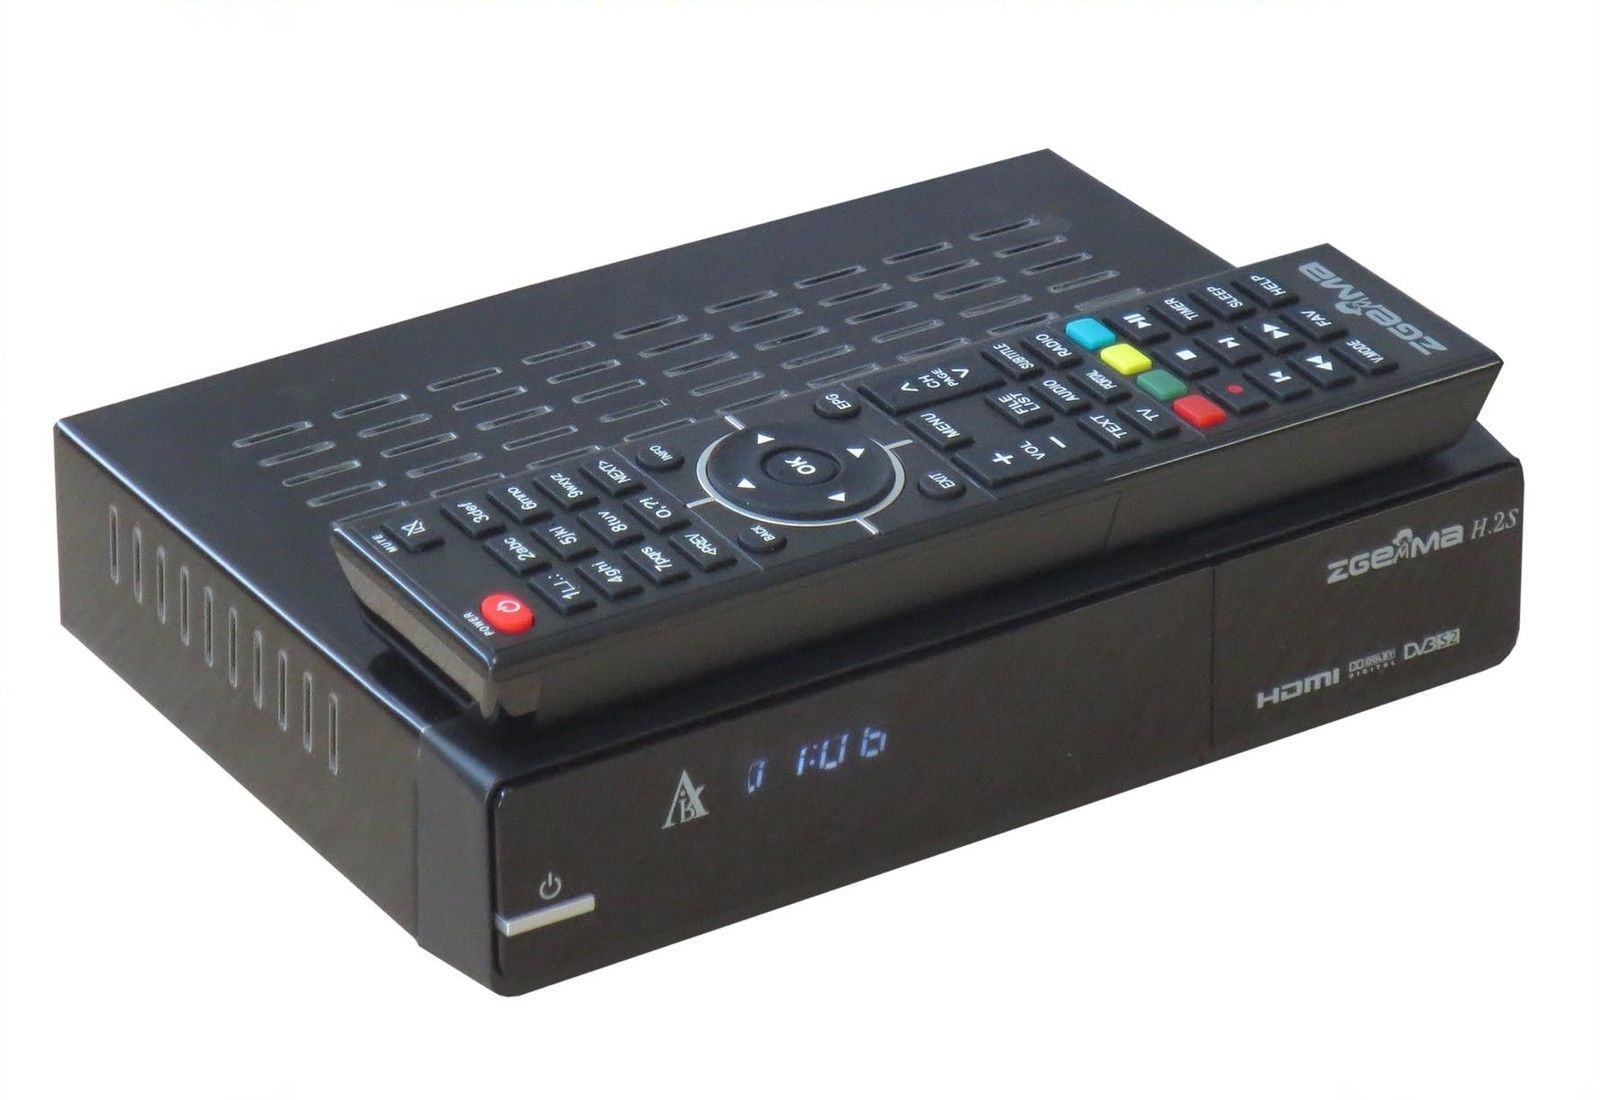 Zgemma H 2H Combo DVB-S2 / DVB-T2 Hybrid Satellite Terrestrial Receiver  Enigma 2